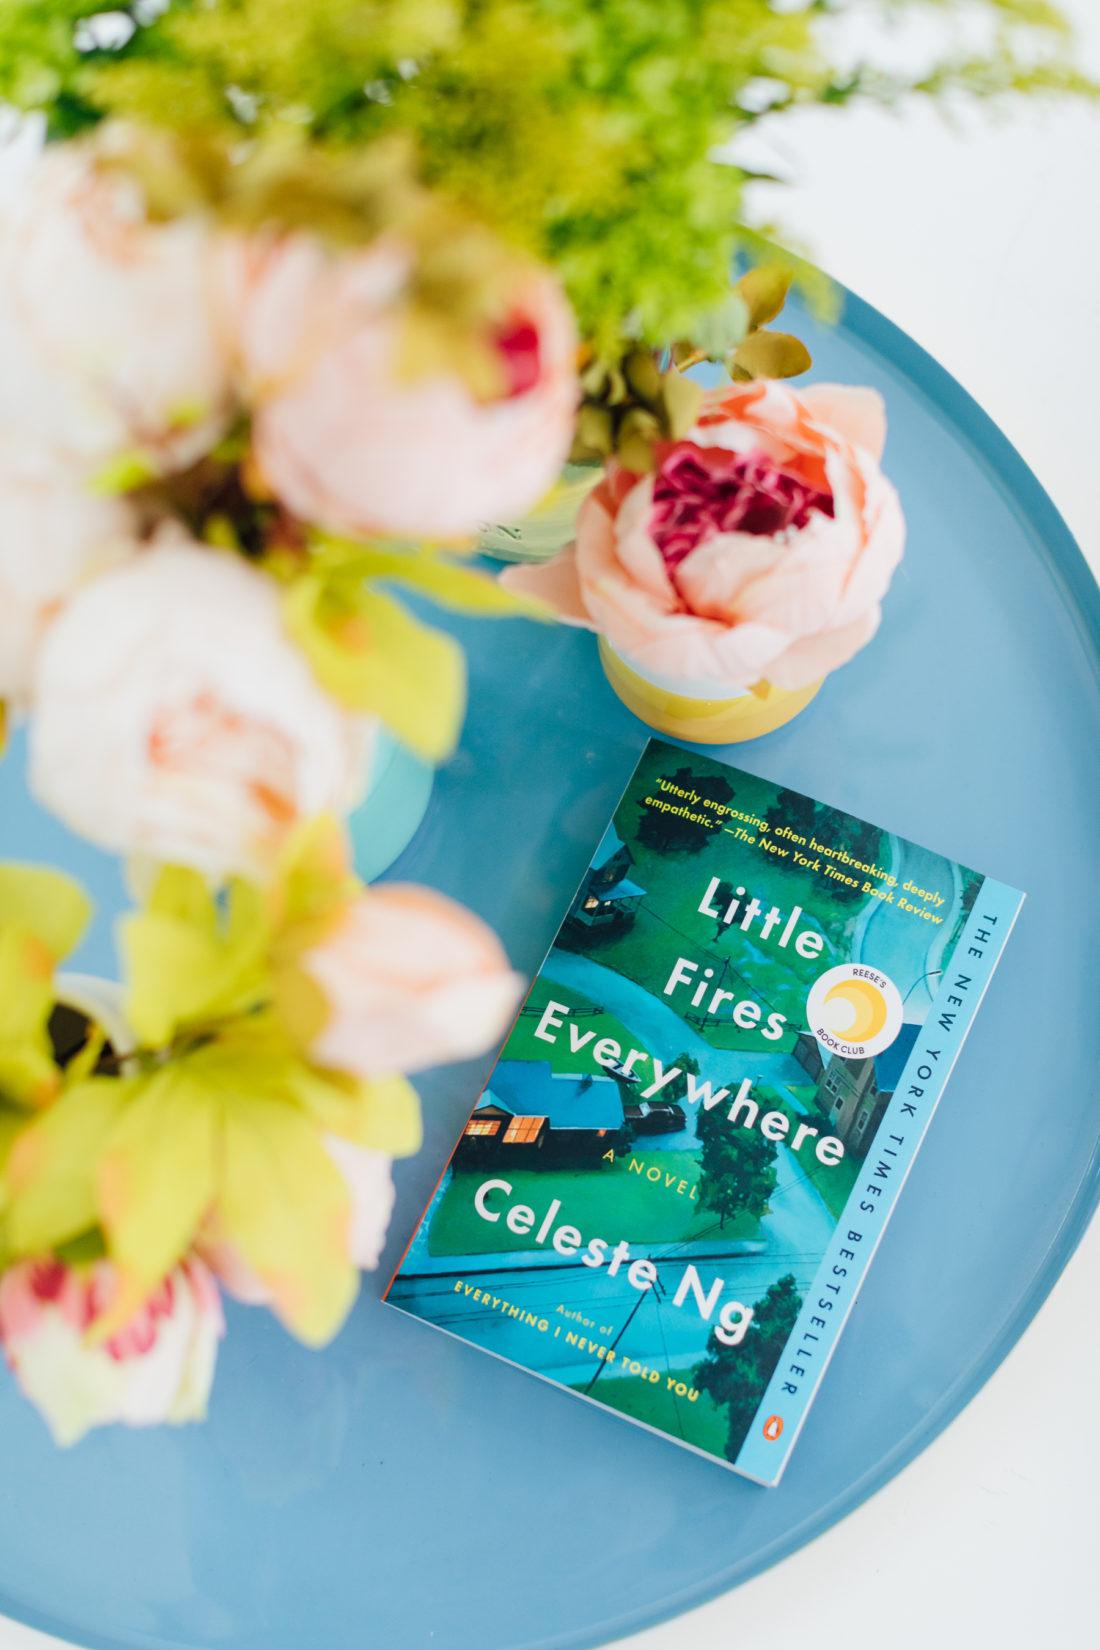 Eva Amurri Martino announces her third HEA Book Club pick: Little Fires Everywhere by Celeste Ng